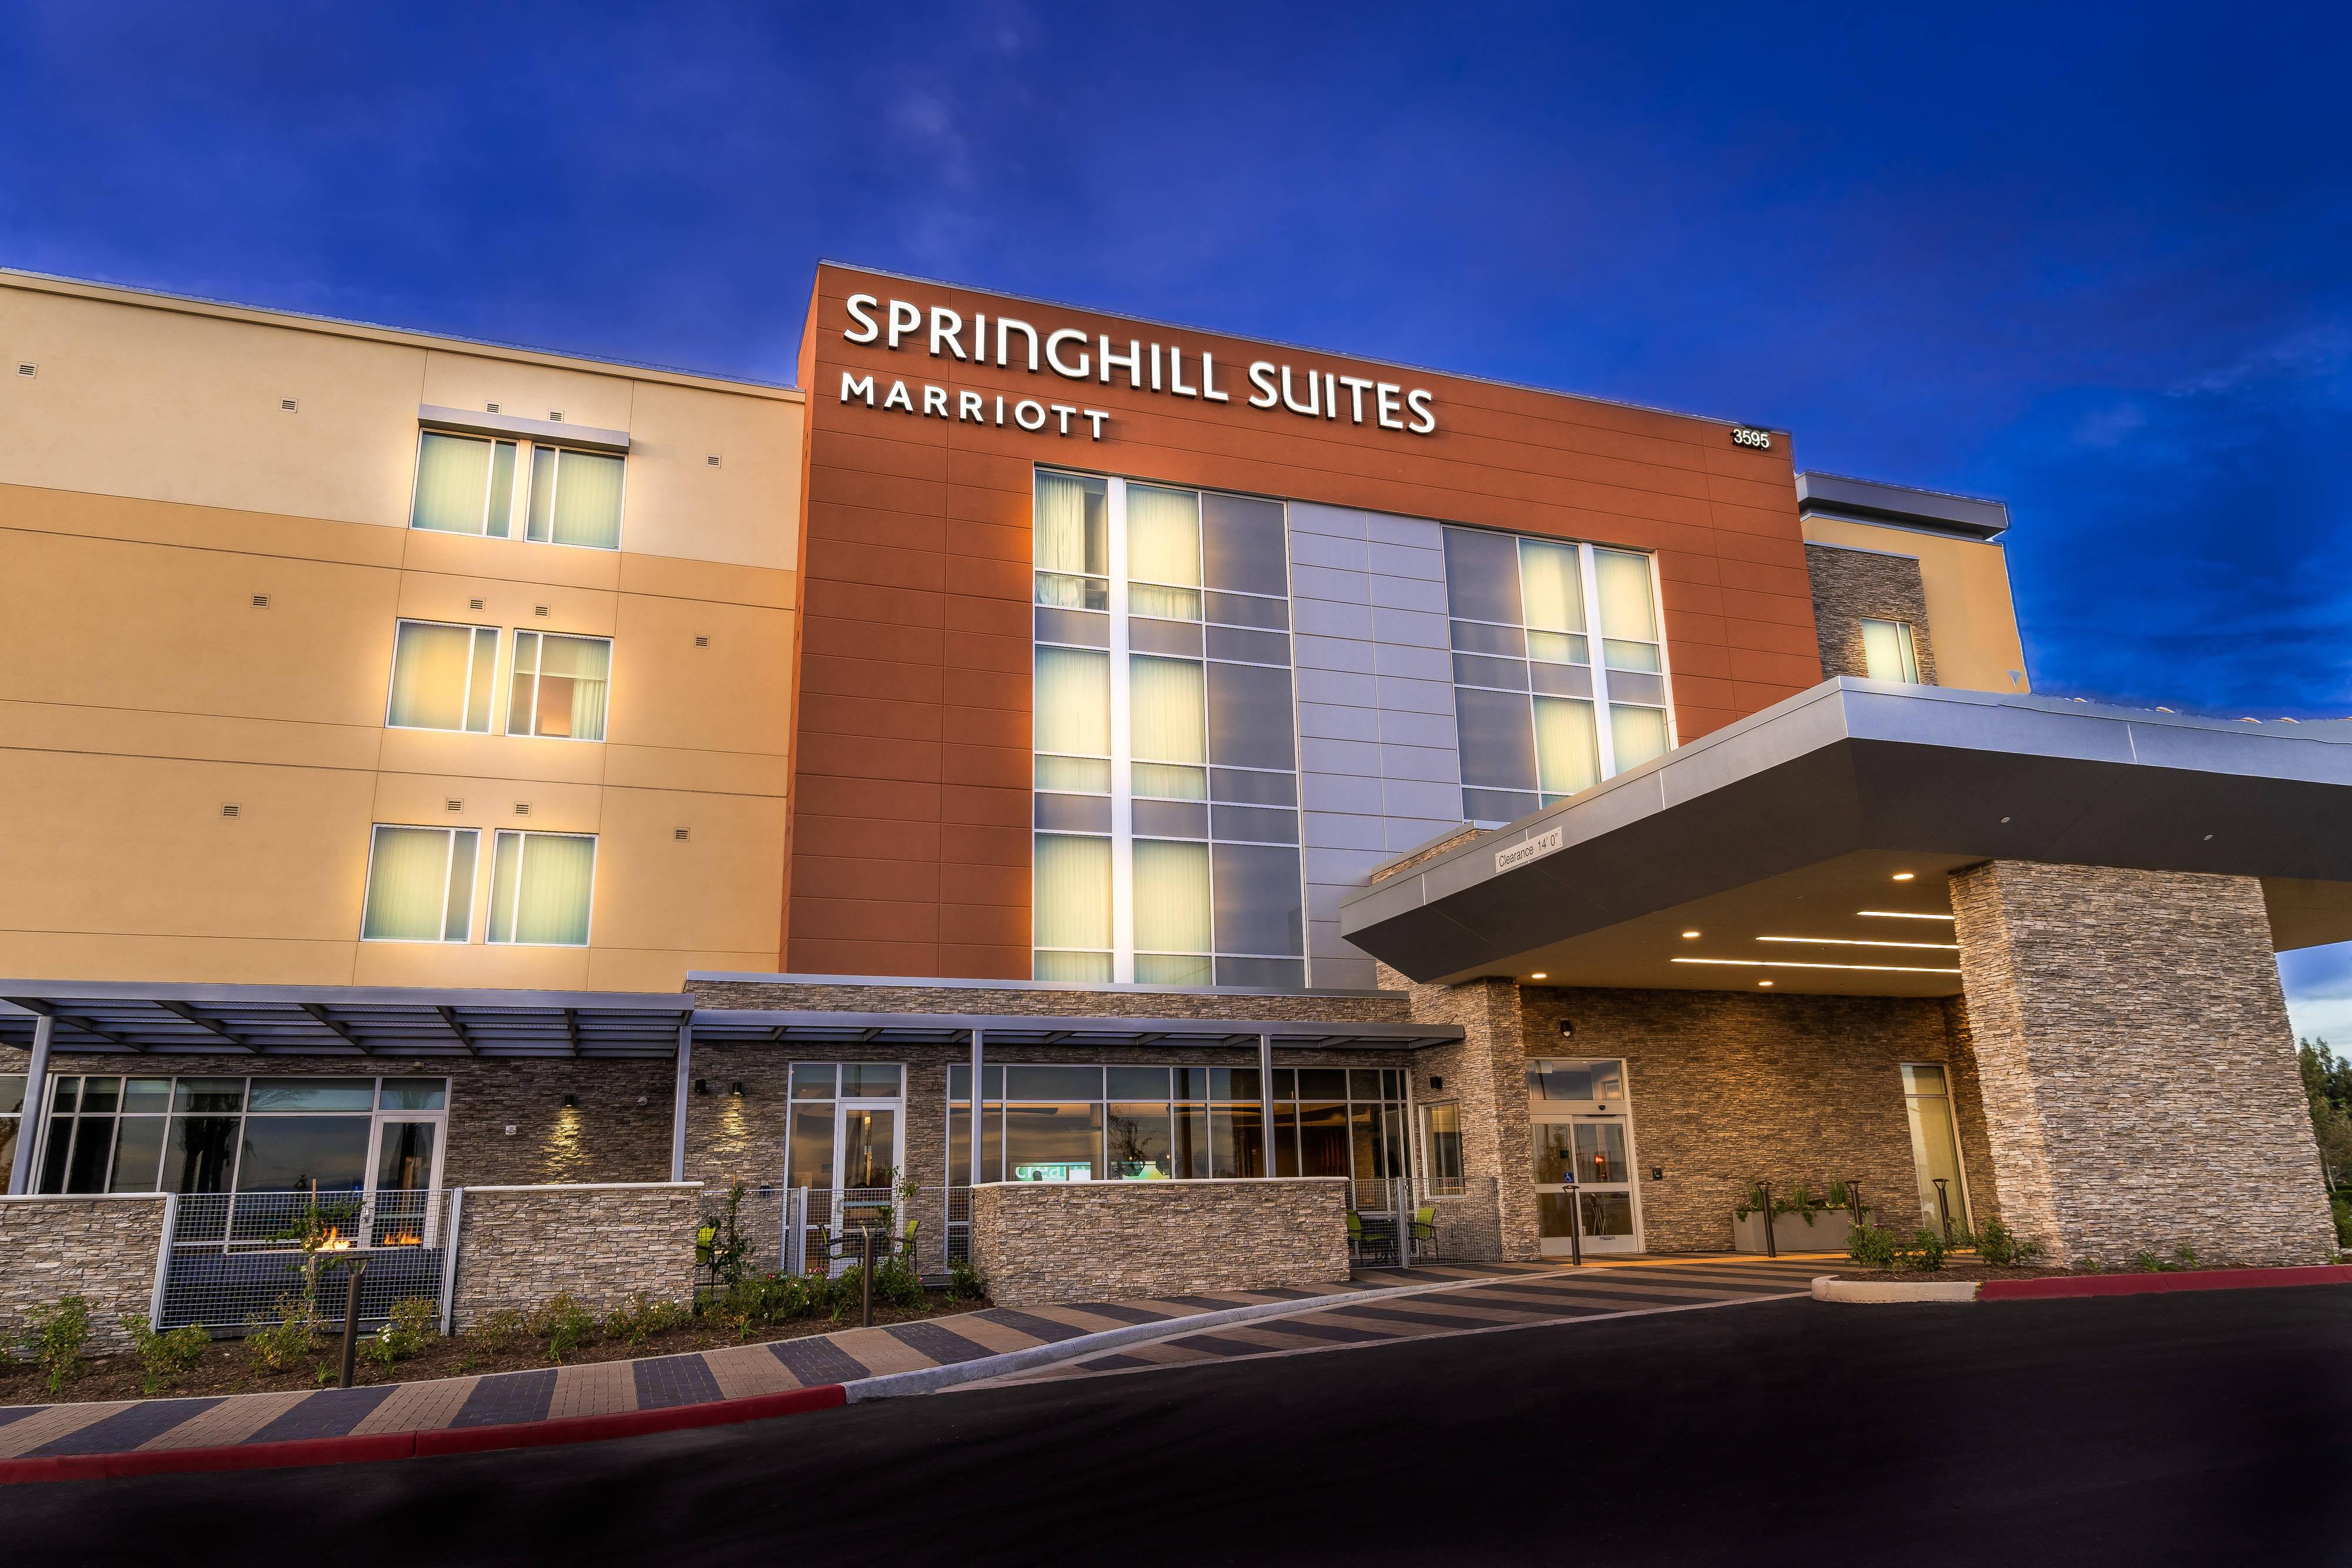 Springhill Suites Marriott Cucamonga Apt